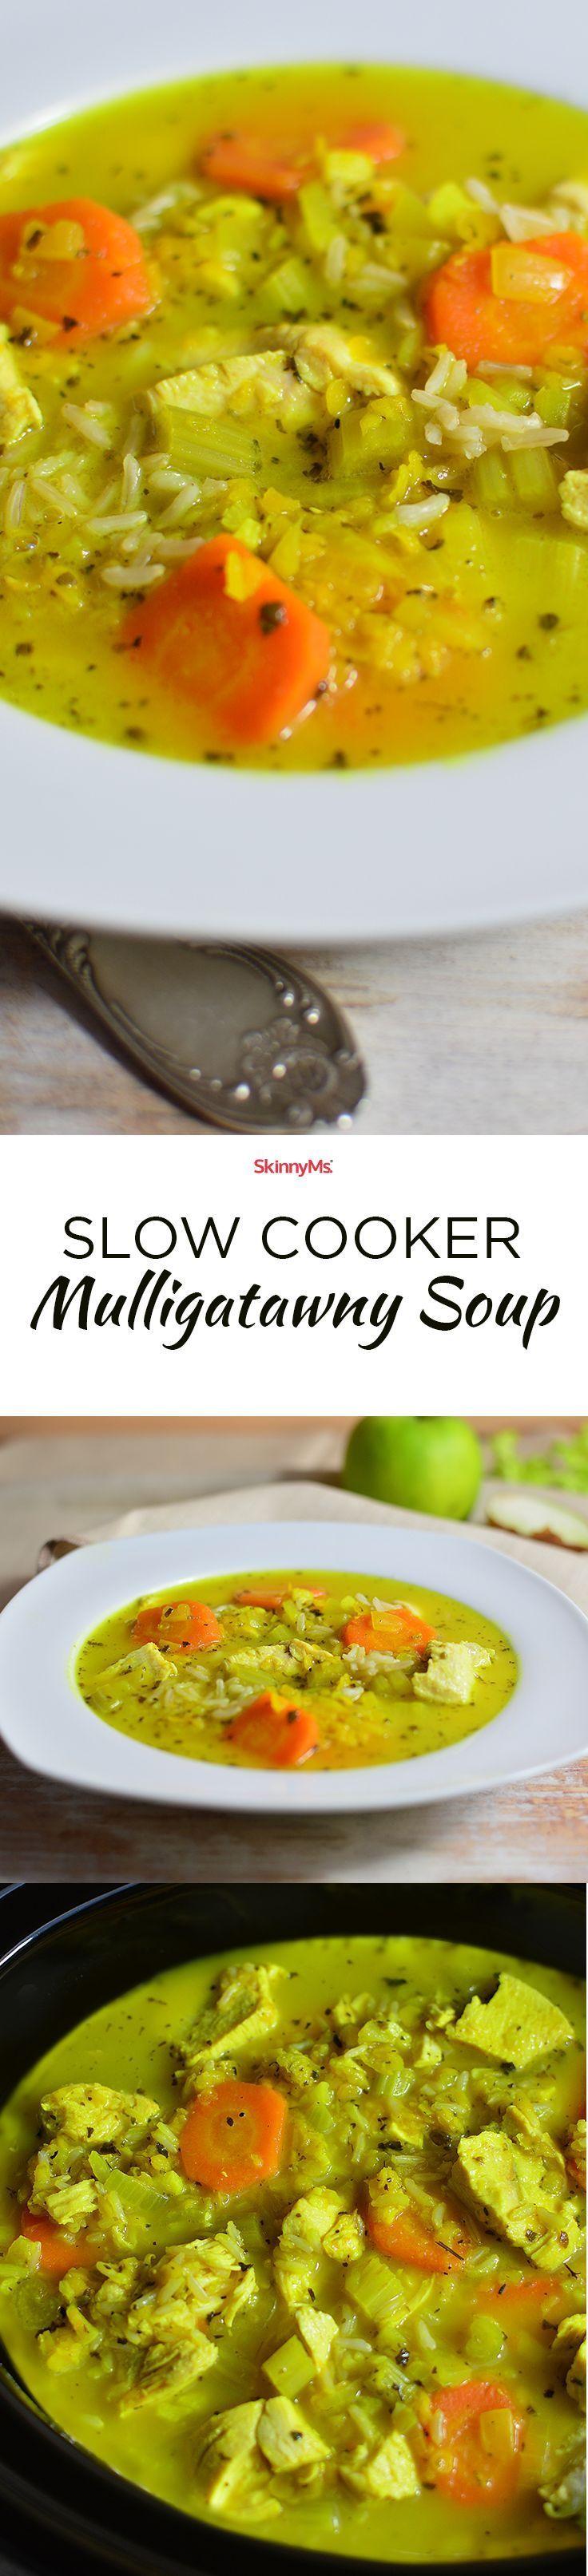 Have you ever hadmulligatawny? Bestsoupever!| Slow Cooker Mulligatawny Soup | mulligatawny soup slow cooker recipe | Skinny Ms.